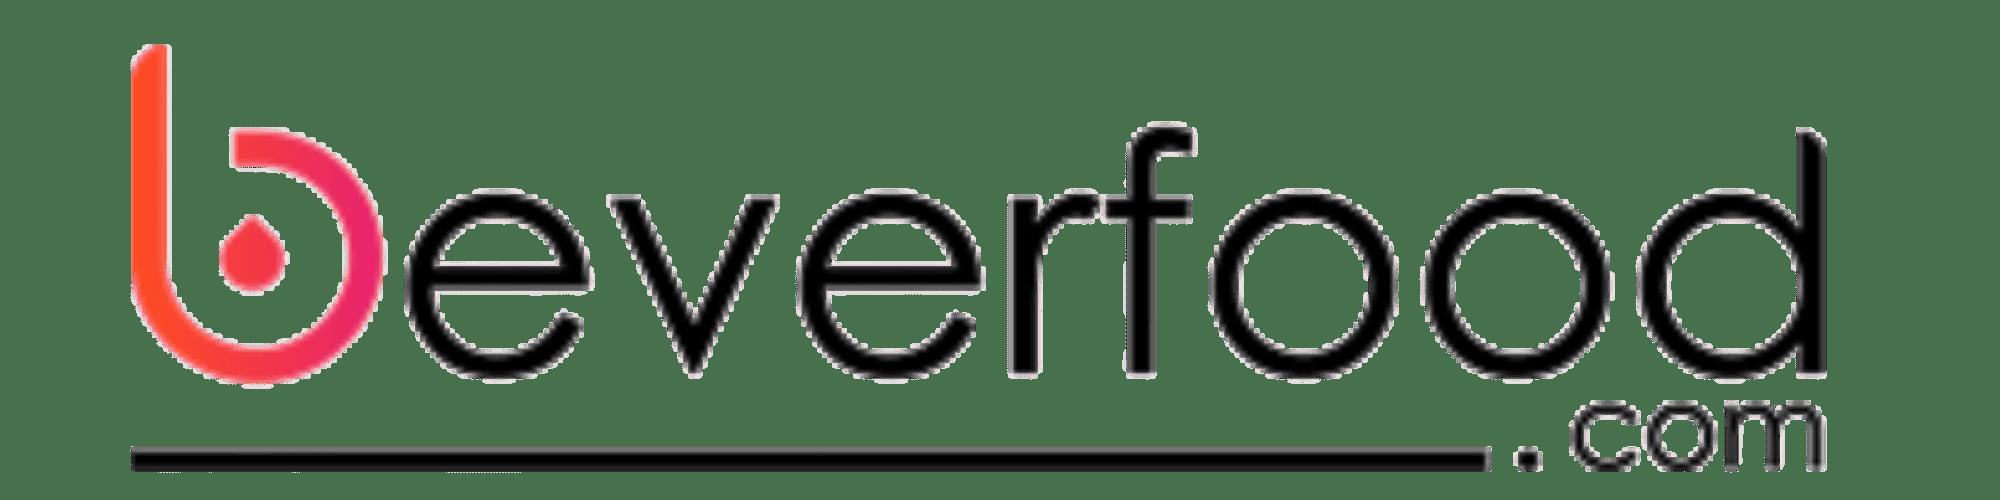 beverfood logo